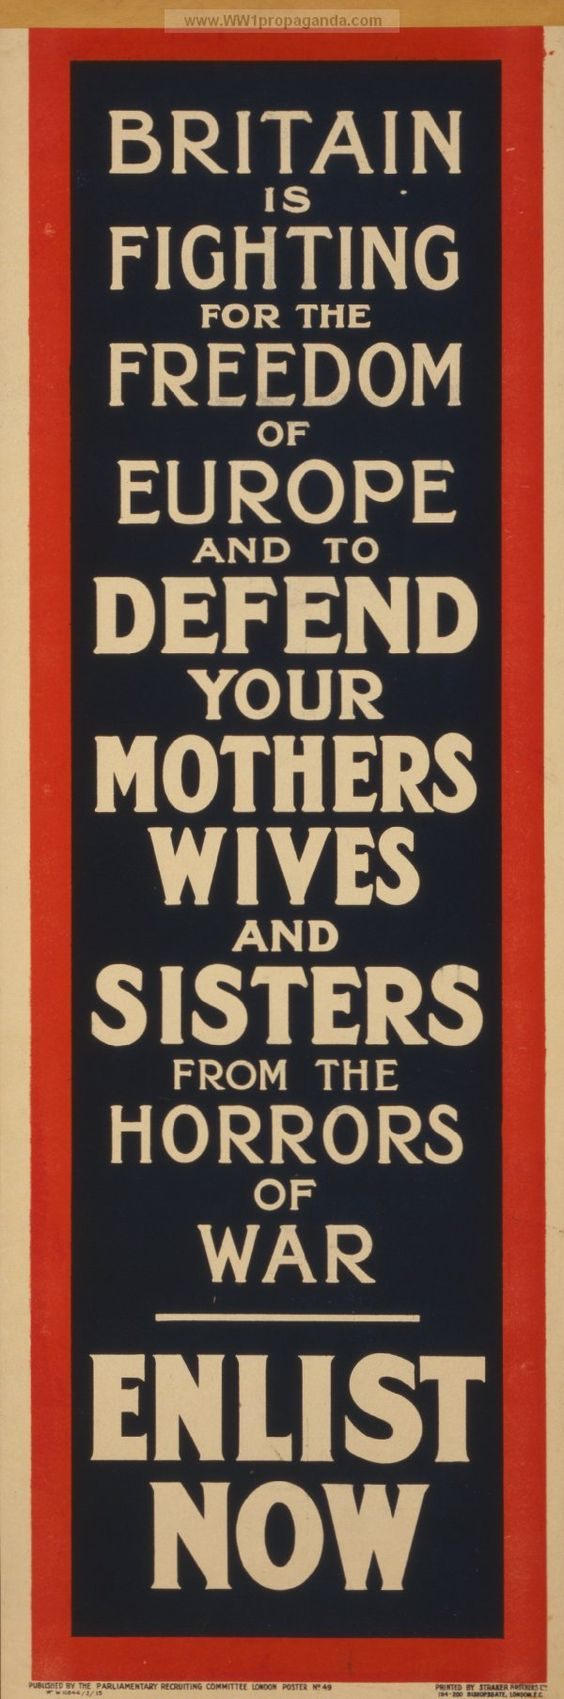 Examples of Propaganda from WW1 | British WW1 Propaganda Posters Page 100